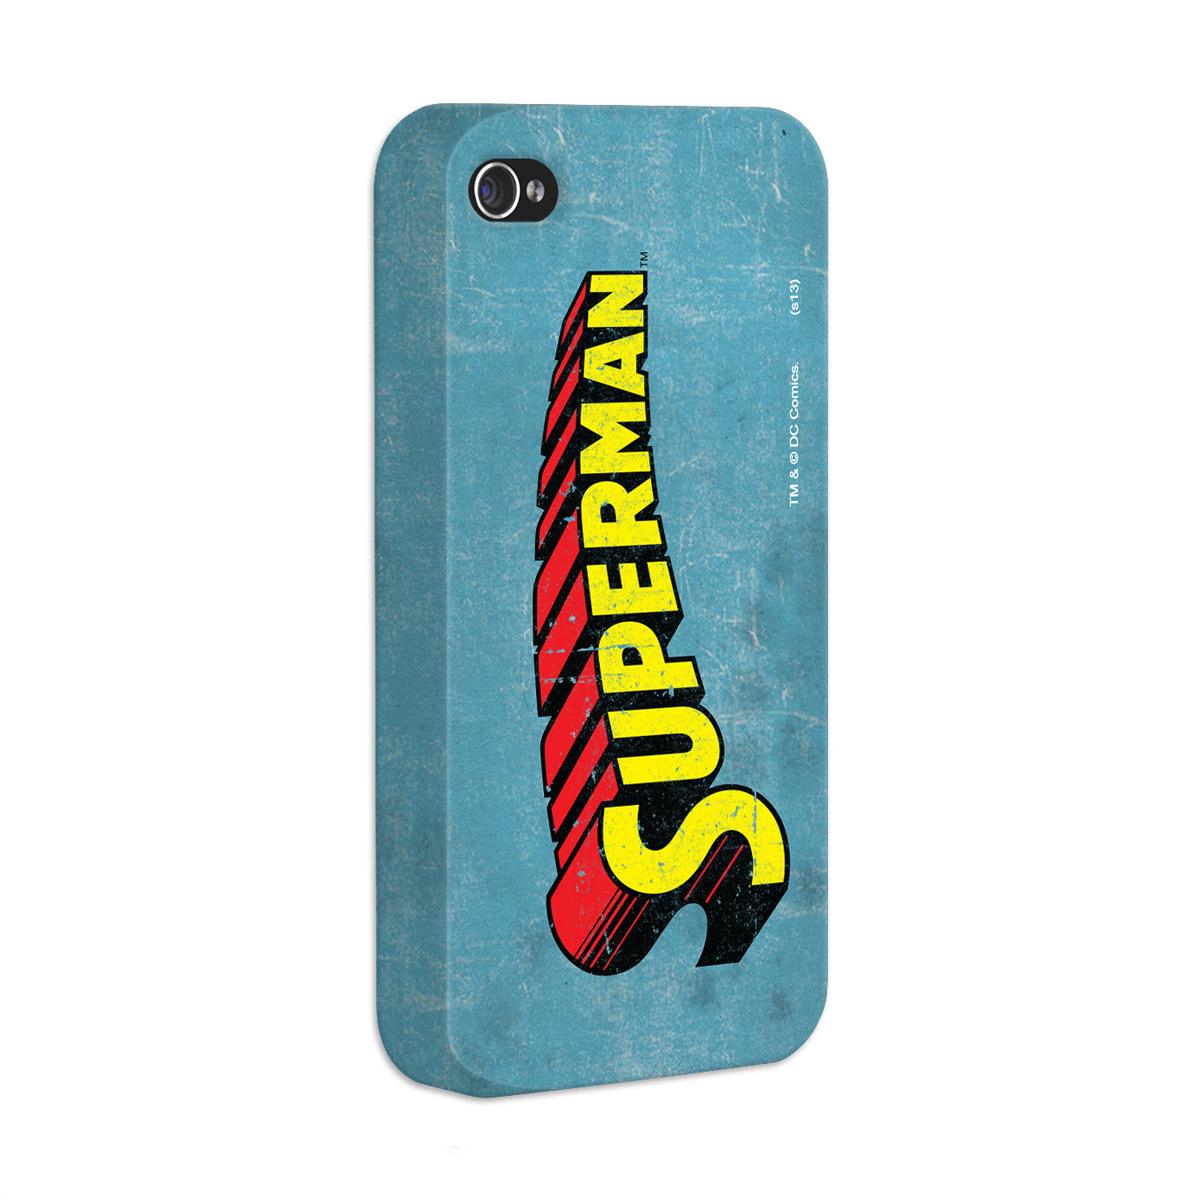 Kit Com 3 Capas de iPhone 4/4S Superman - Logos